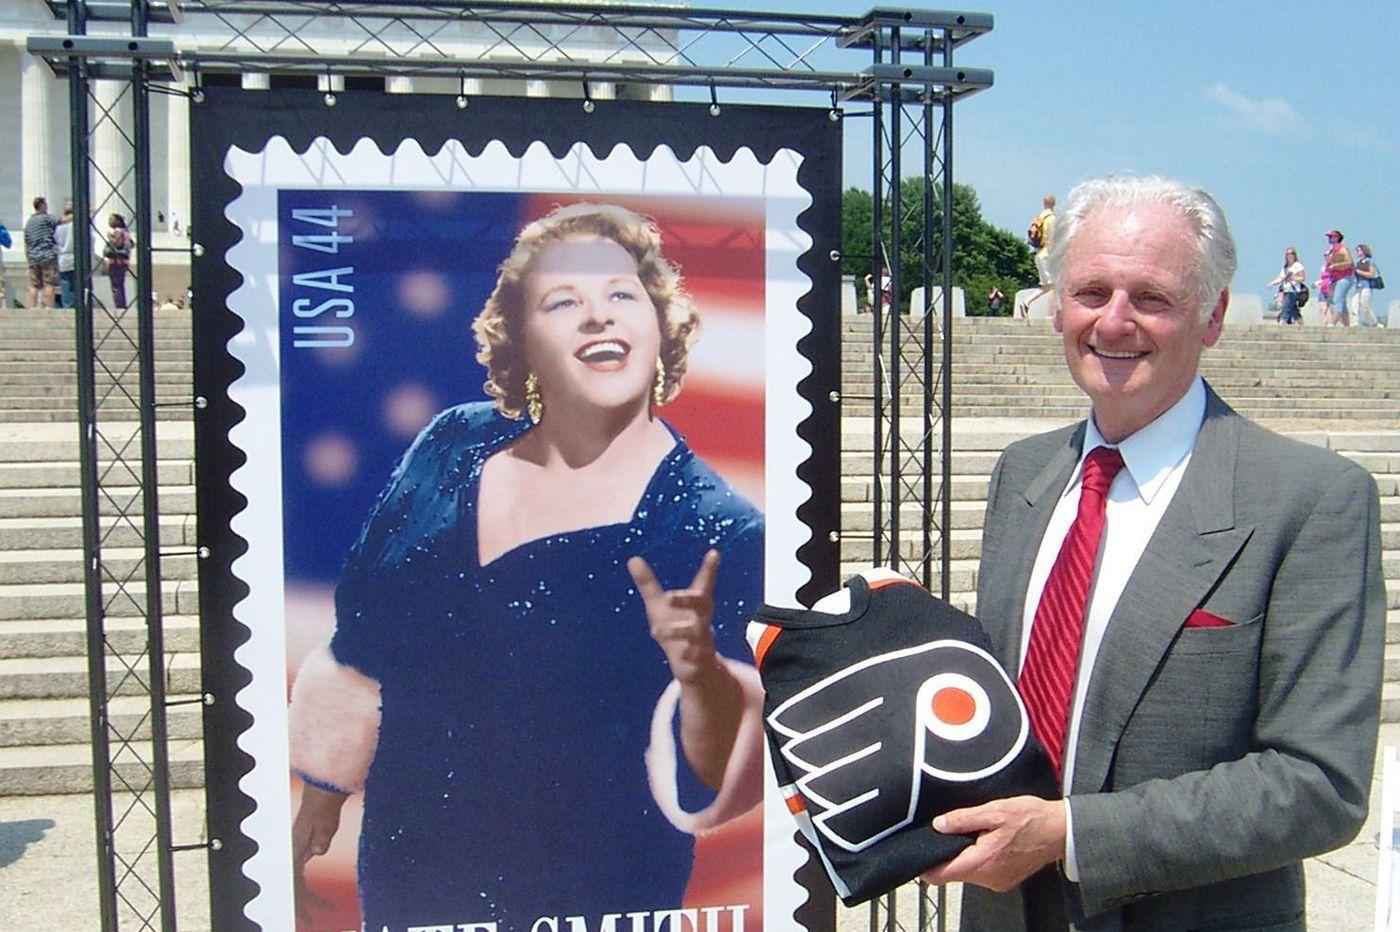 Villanova Man Wants to Bring a Sports Museum to Philadelphia